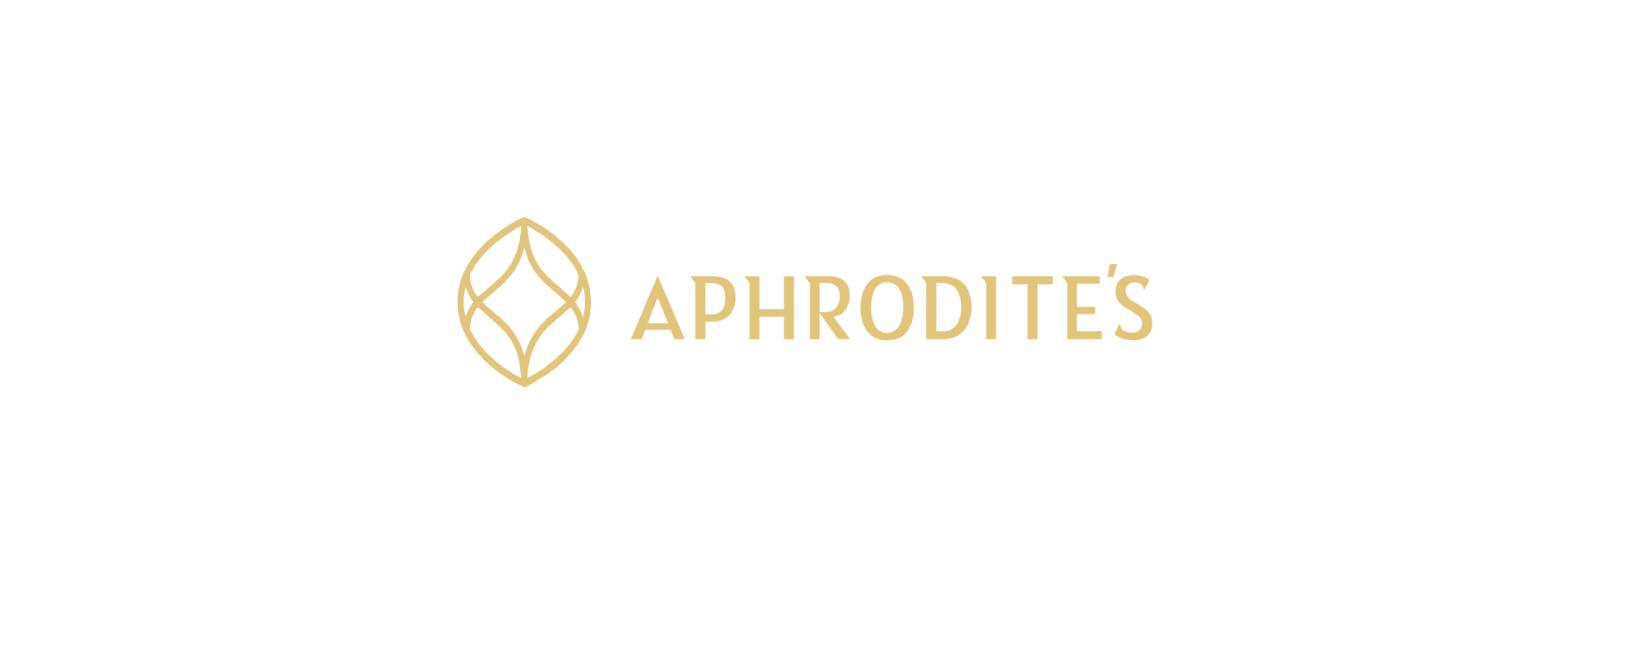 Aphrodite's Discount Code 2021